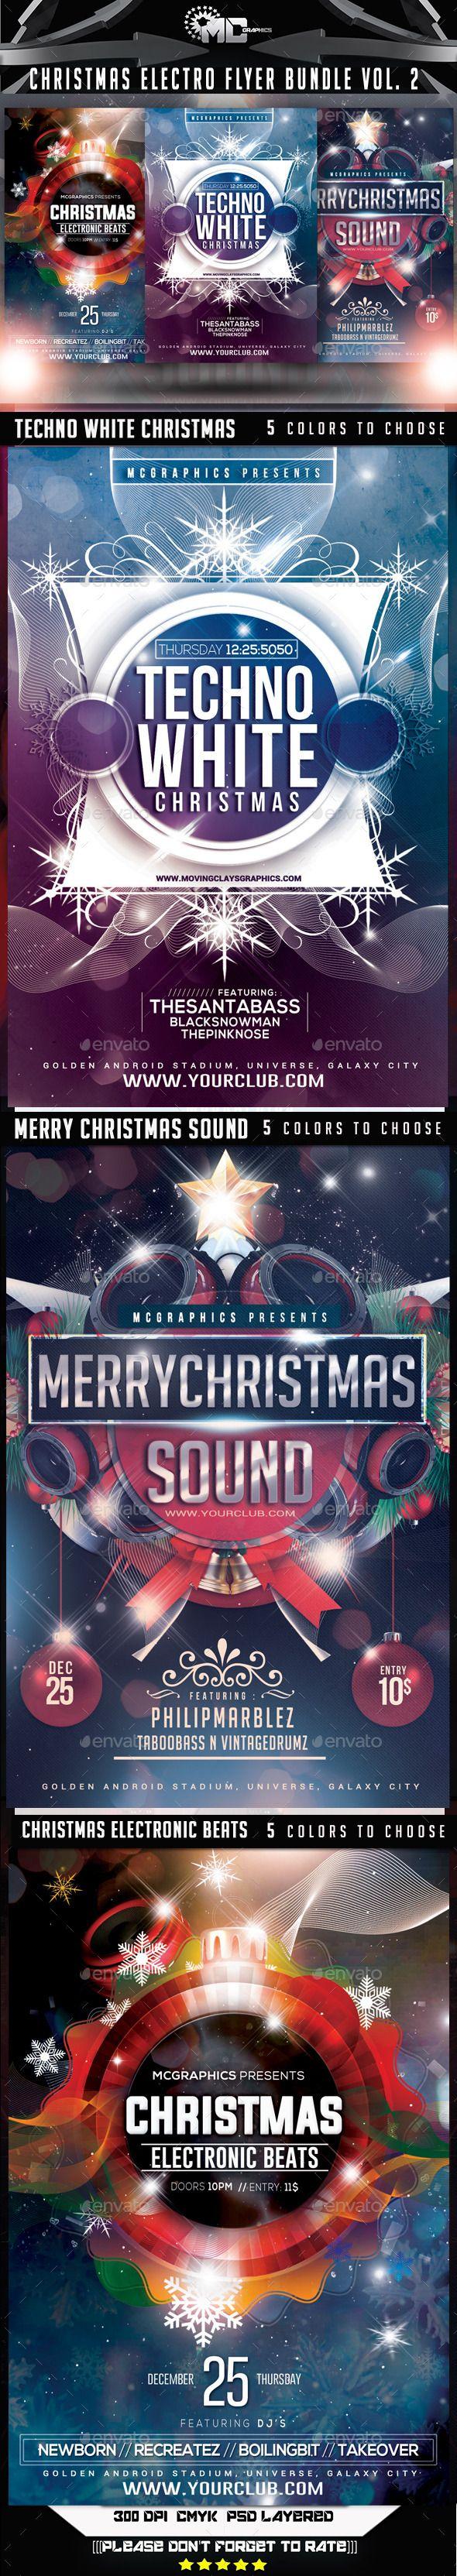 Christmas Electro Flyer Bundle Template PSD #design #xmas Download: http://graphicriver.net/item/christmas-electro-flyer-bundle-vol-2/9617207?ref=ksioks